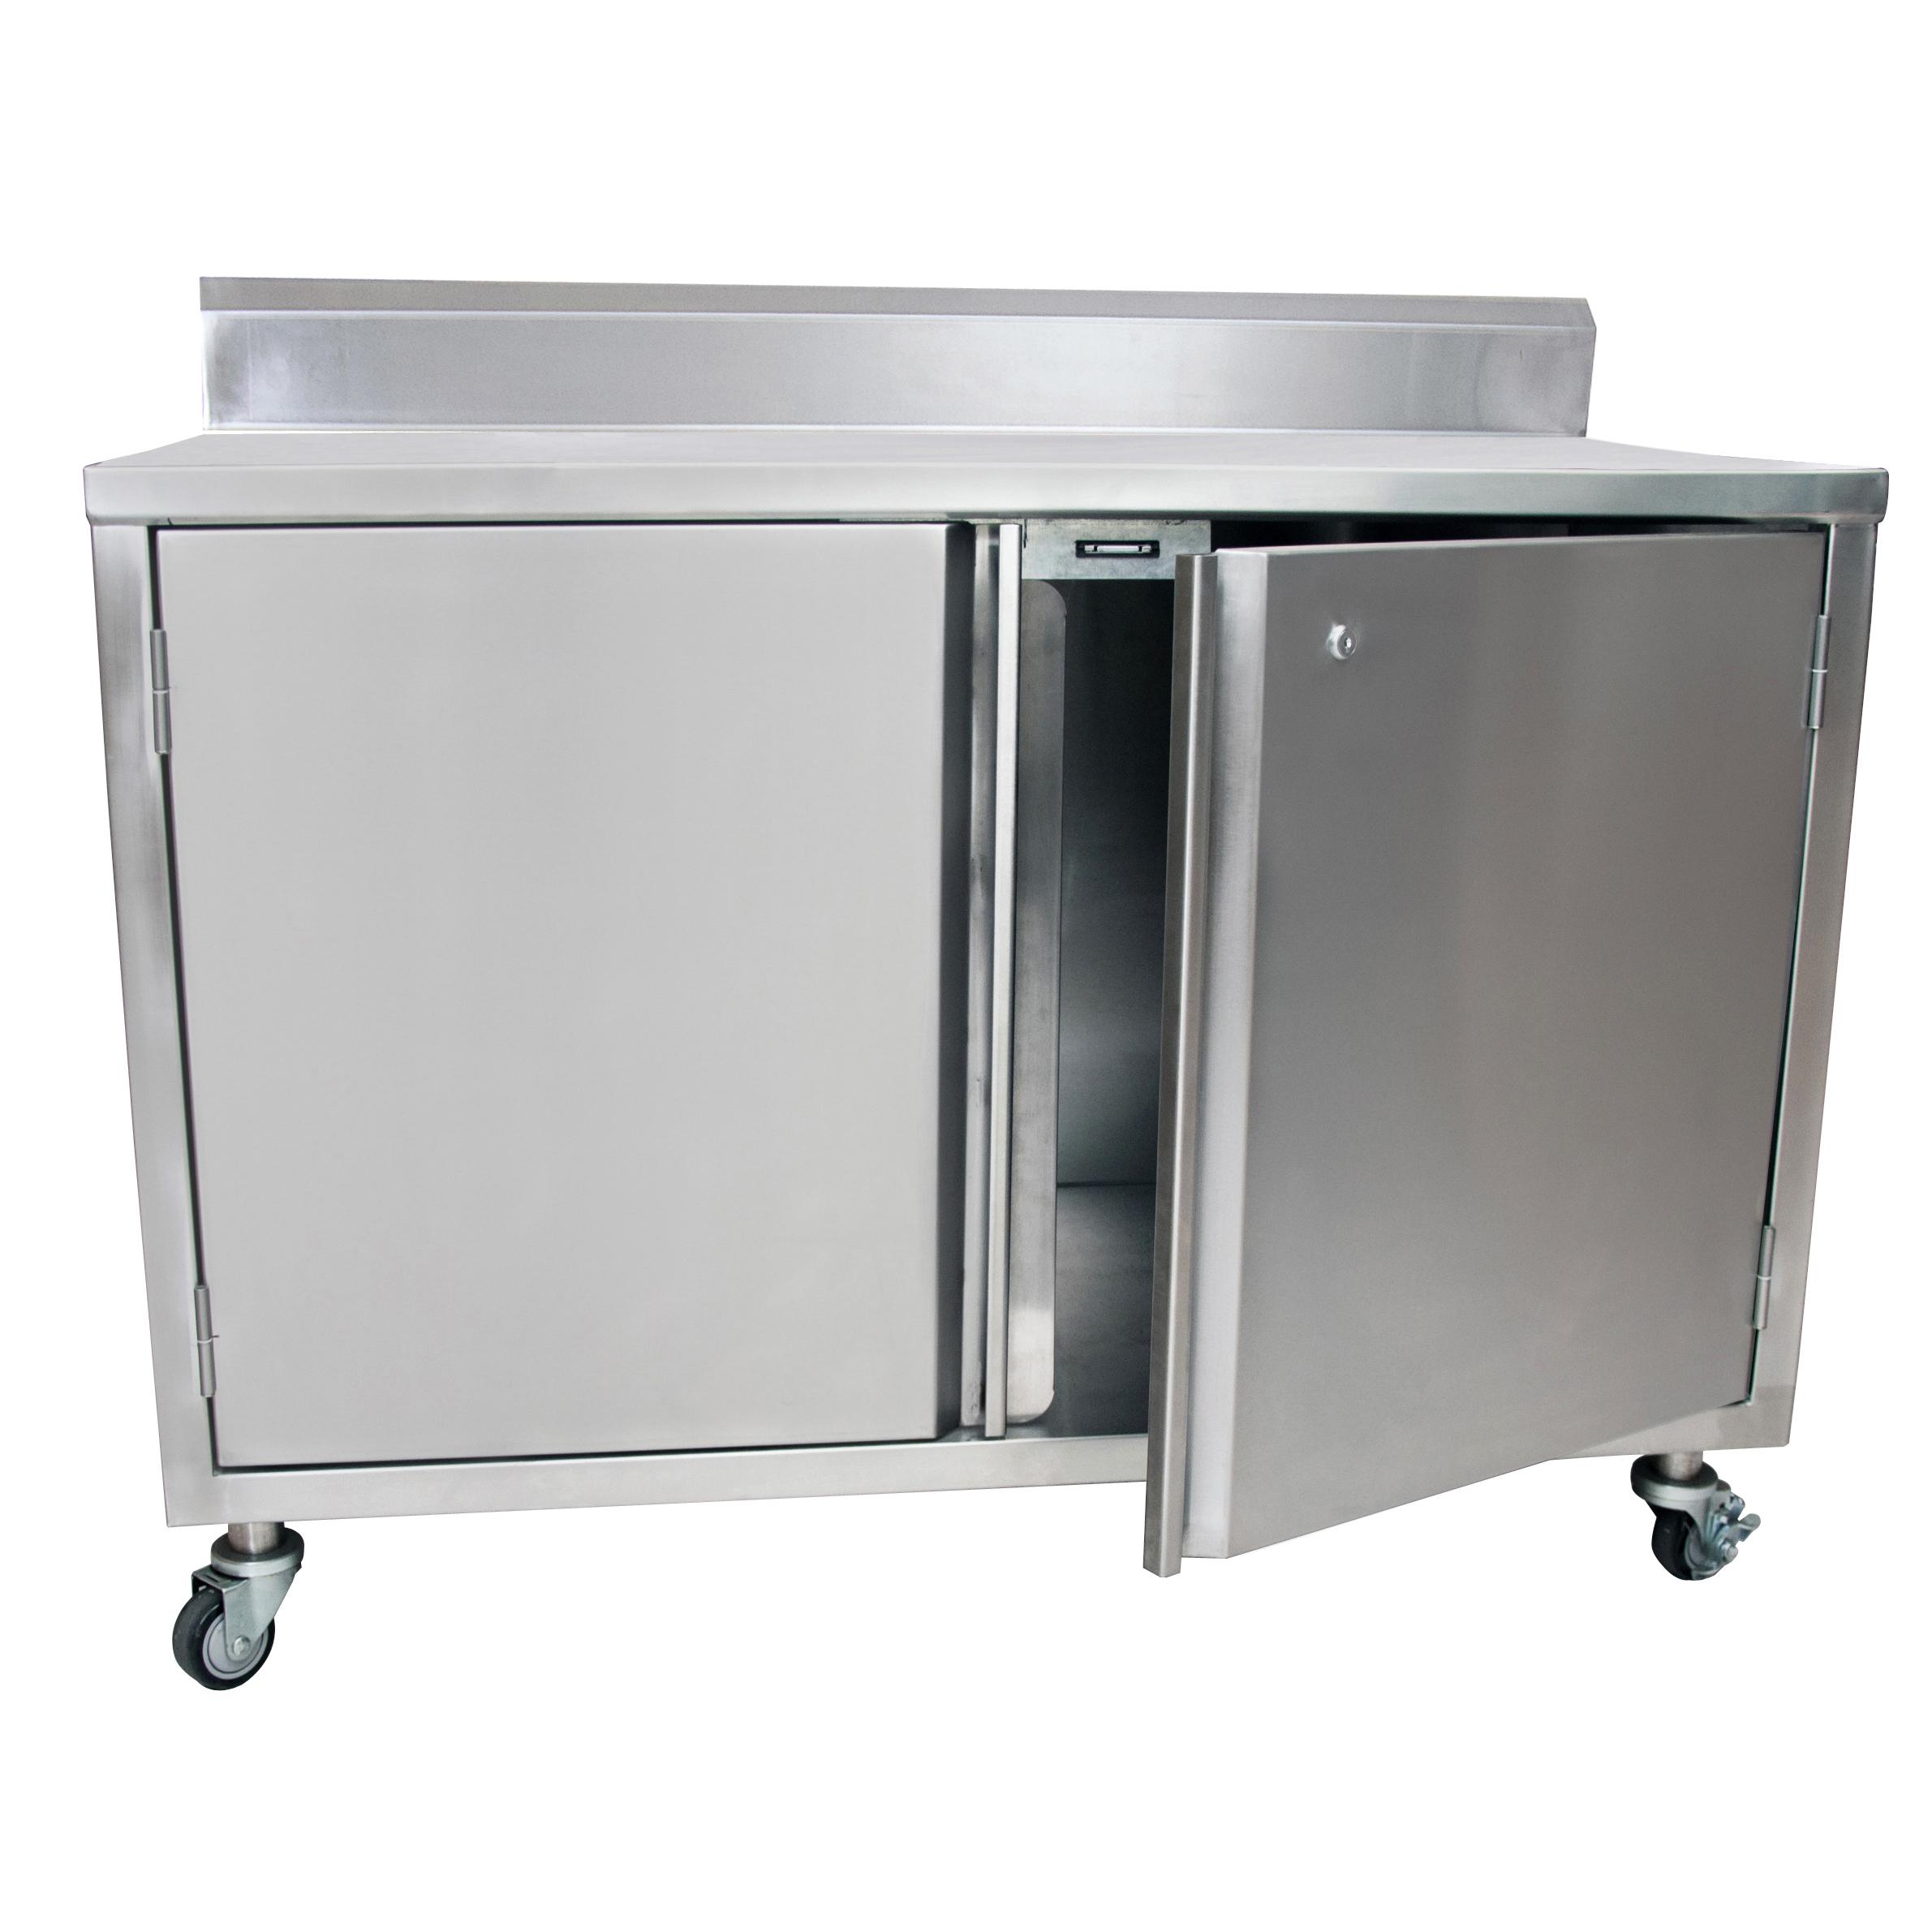 BK Resources BKDCR5-2424HL work table, cabinet base hinged doors